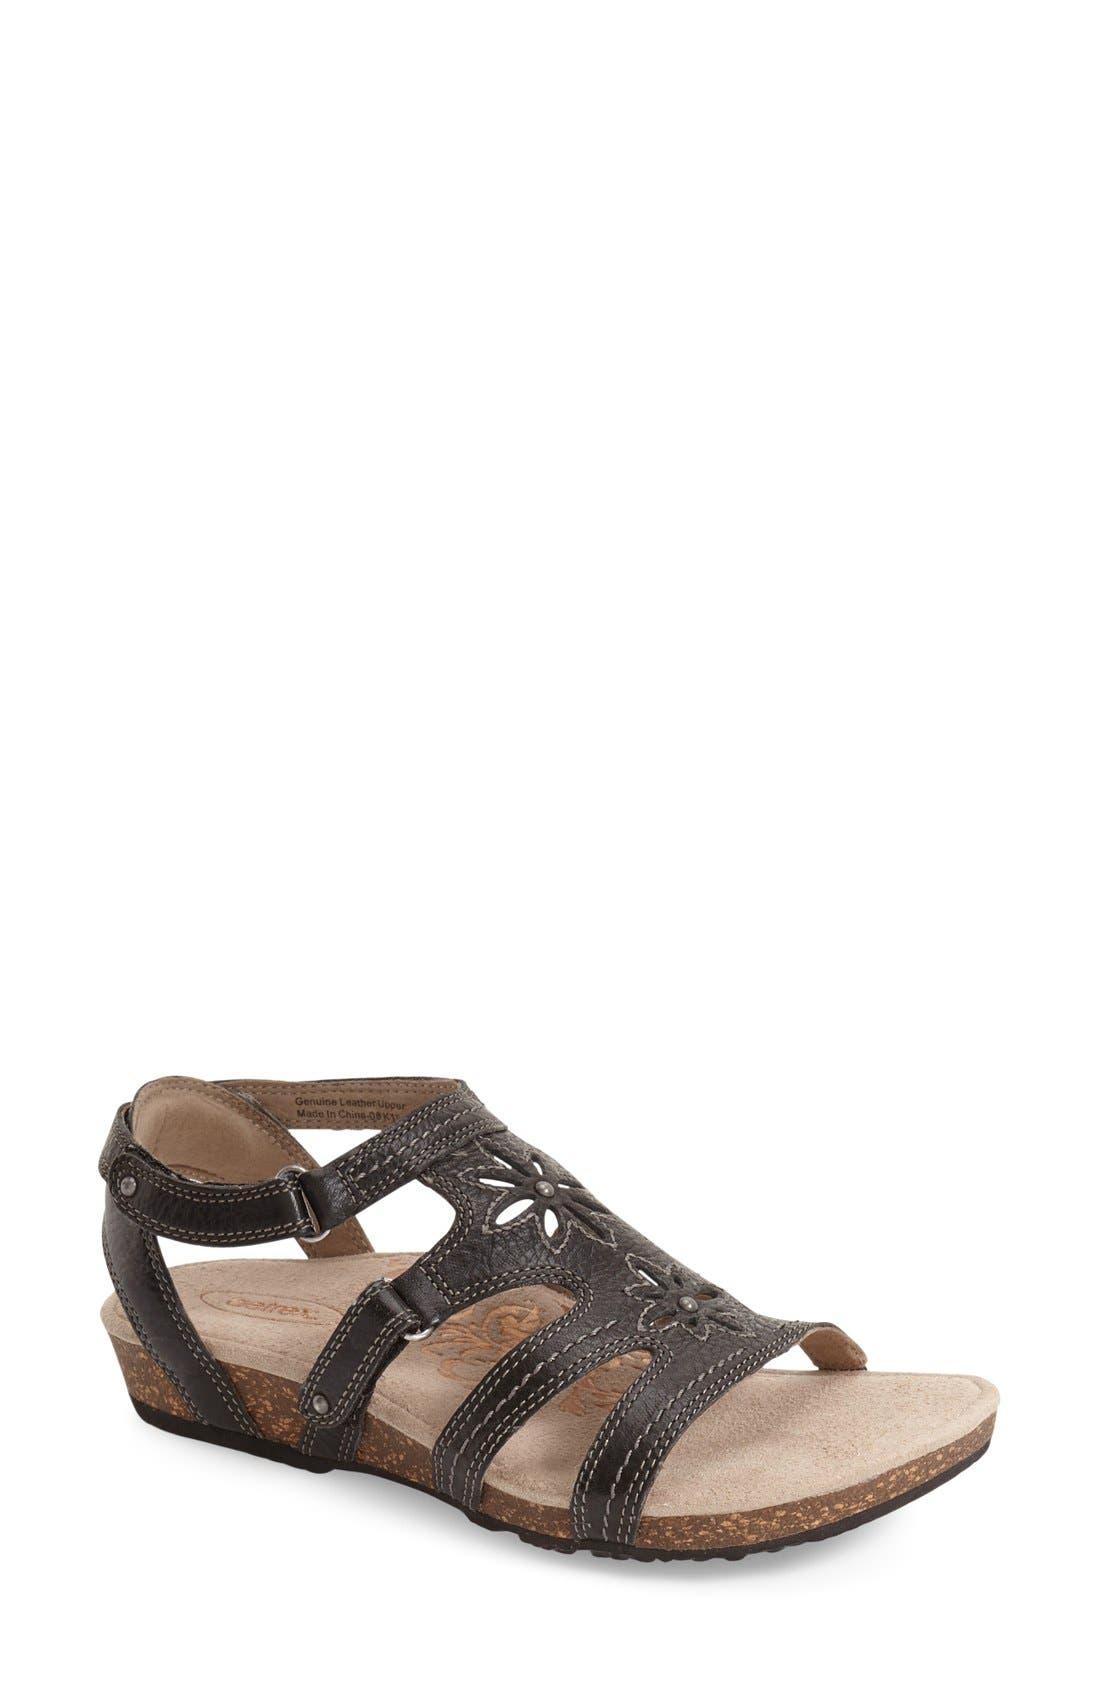 Alternate Image 1 Selected - Aetrex 'Natasha' Gladiator Sandal (Women)